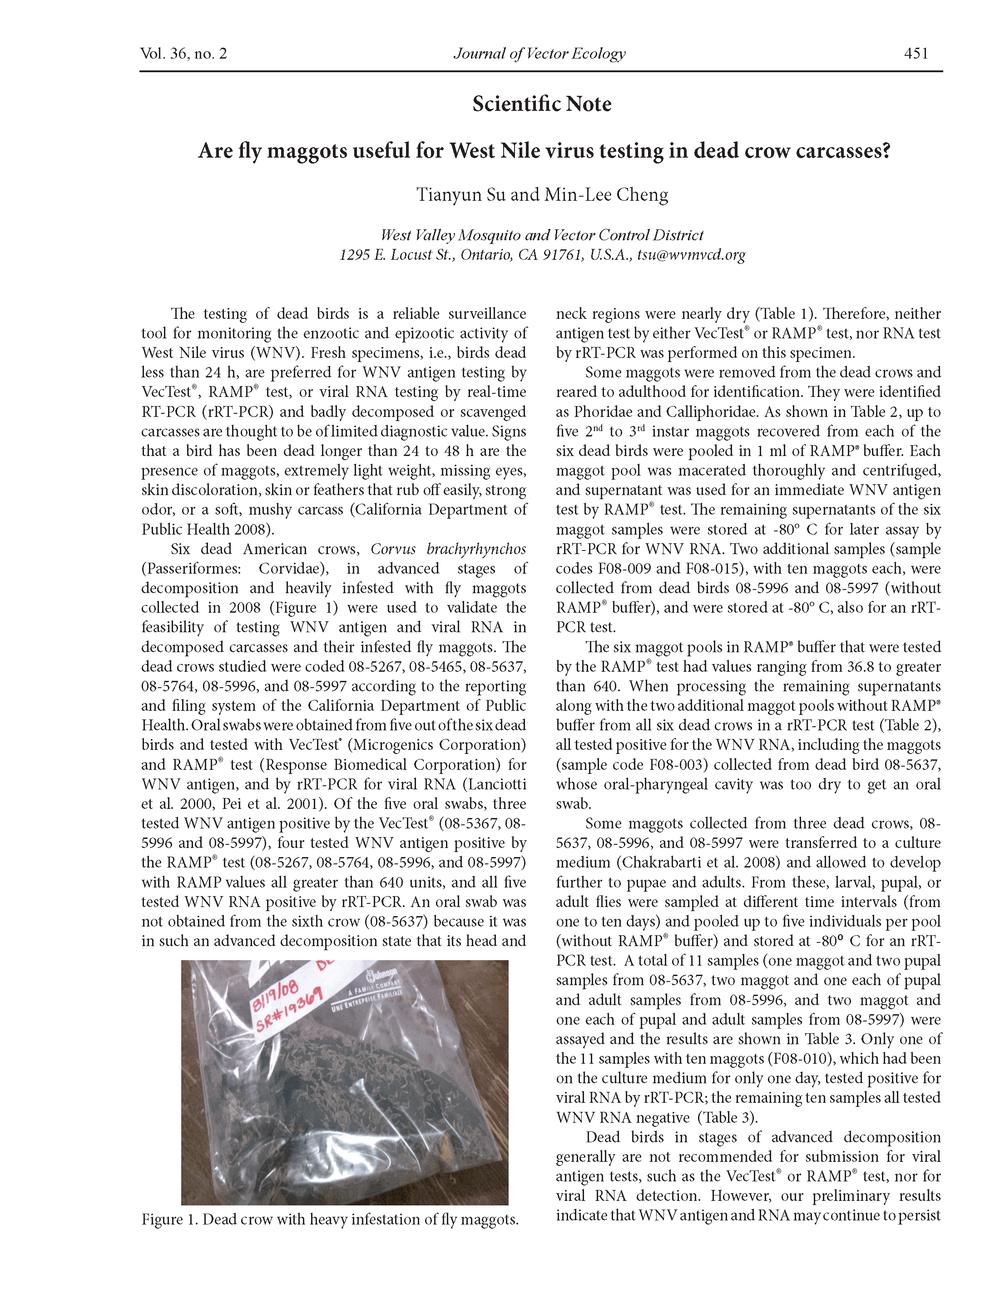 Fly maggot-WNV testing-JVE Vol. 36 PP. 451-453_Page_1.png